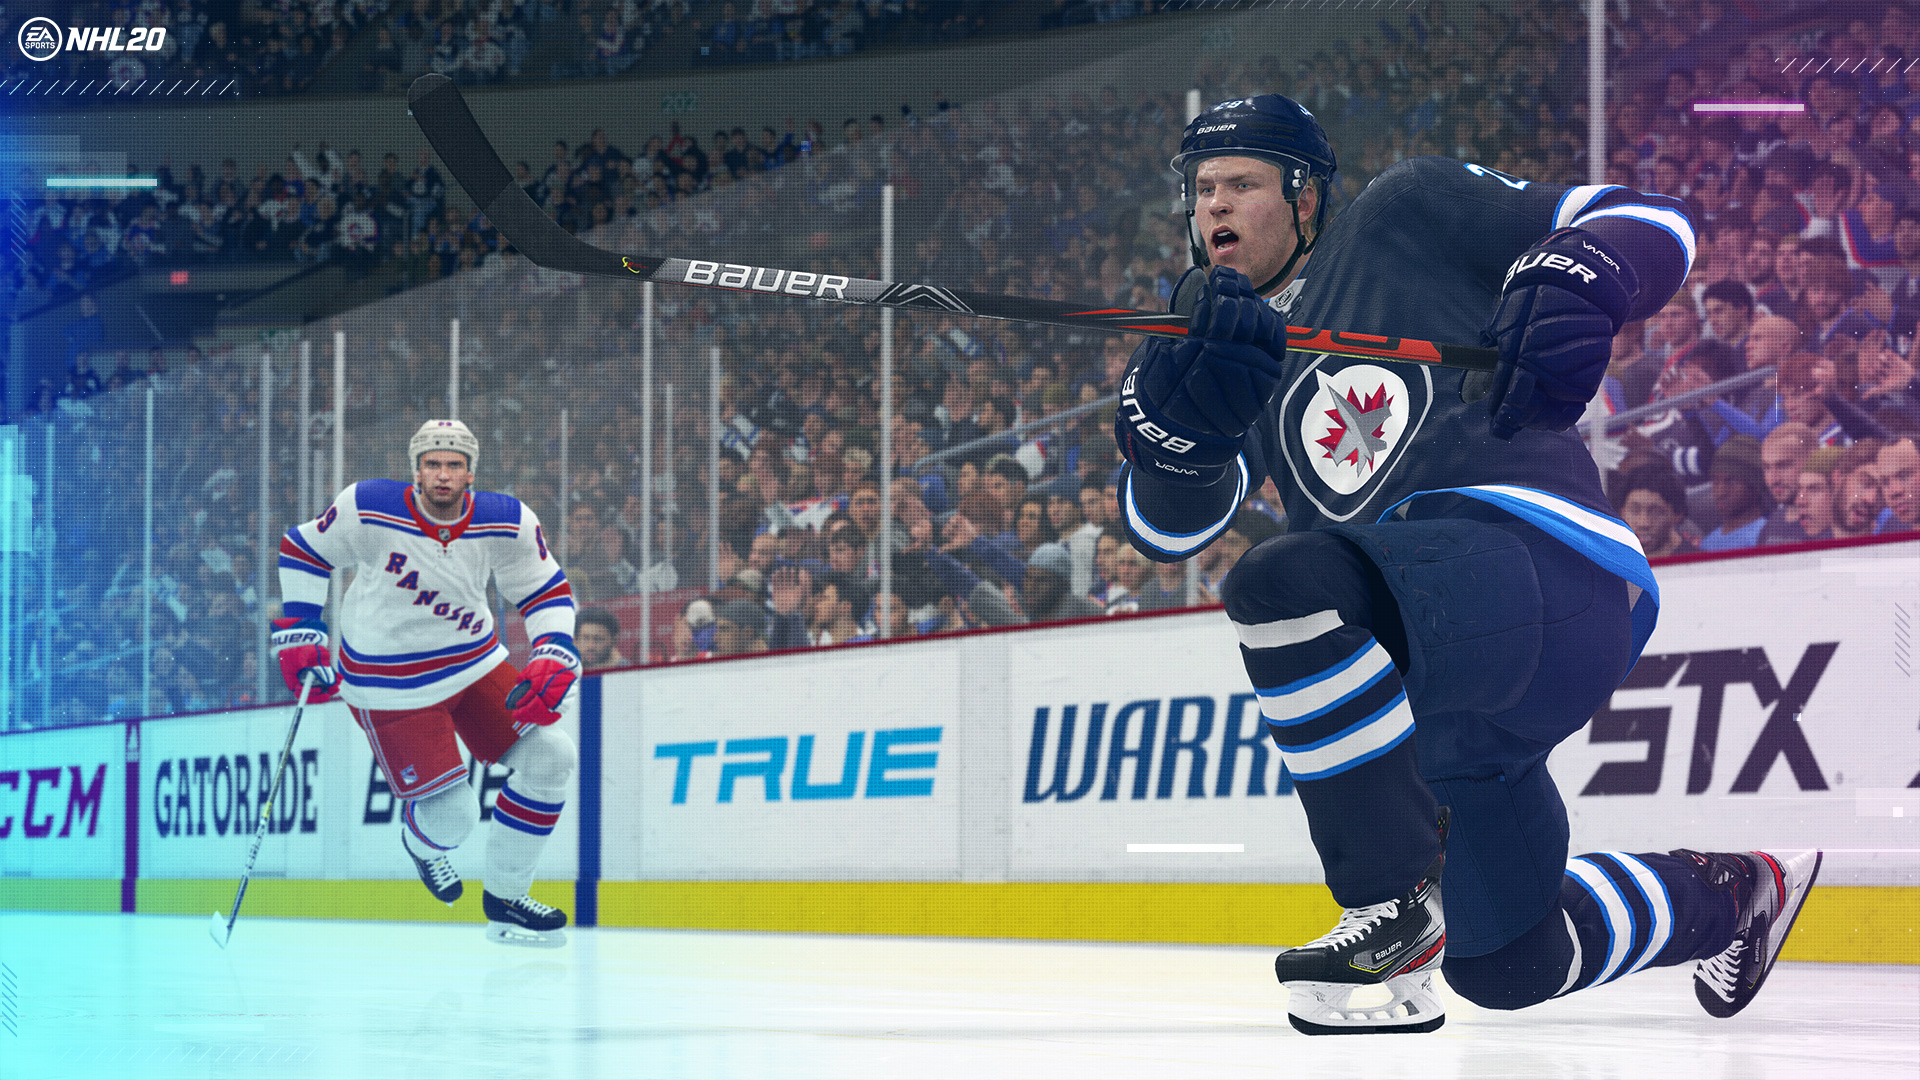 NHL 20 Laine